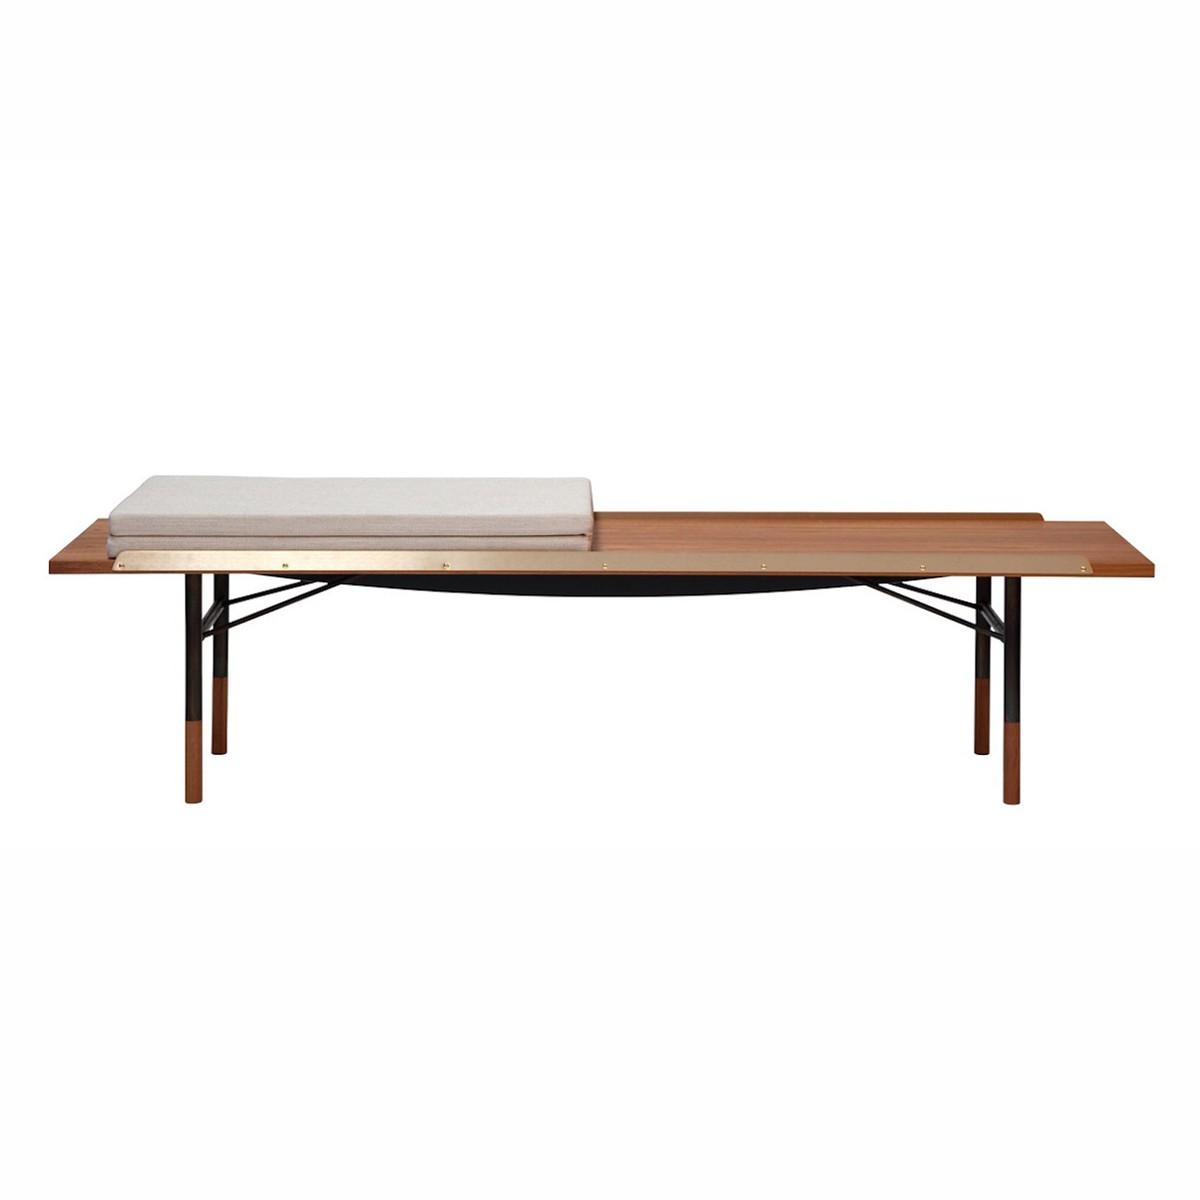 Picture of: Table Bench By Finn Juhl For House Of Finn Juhl